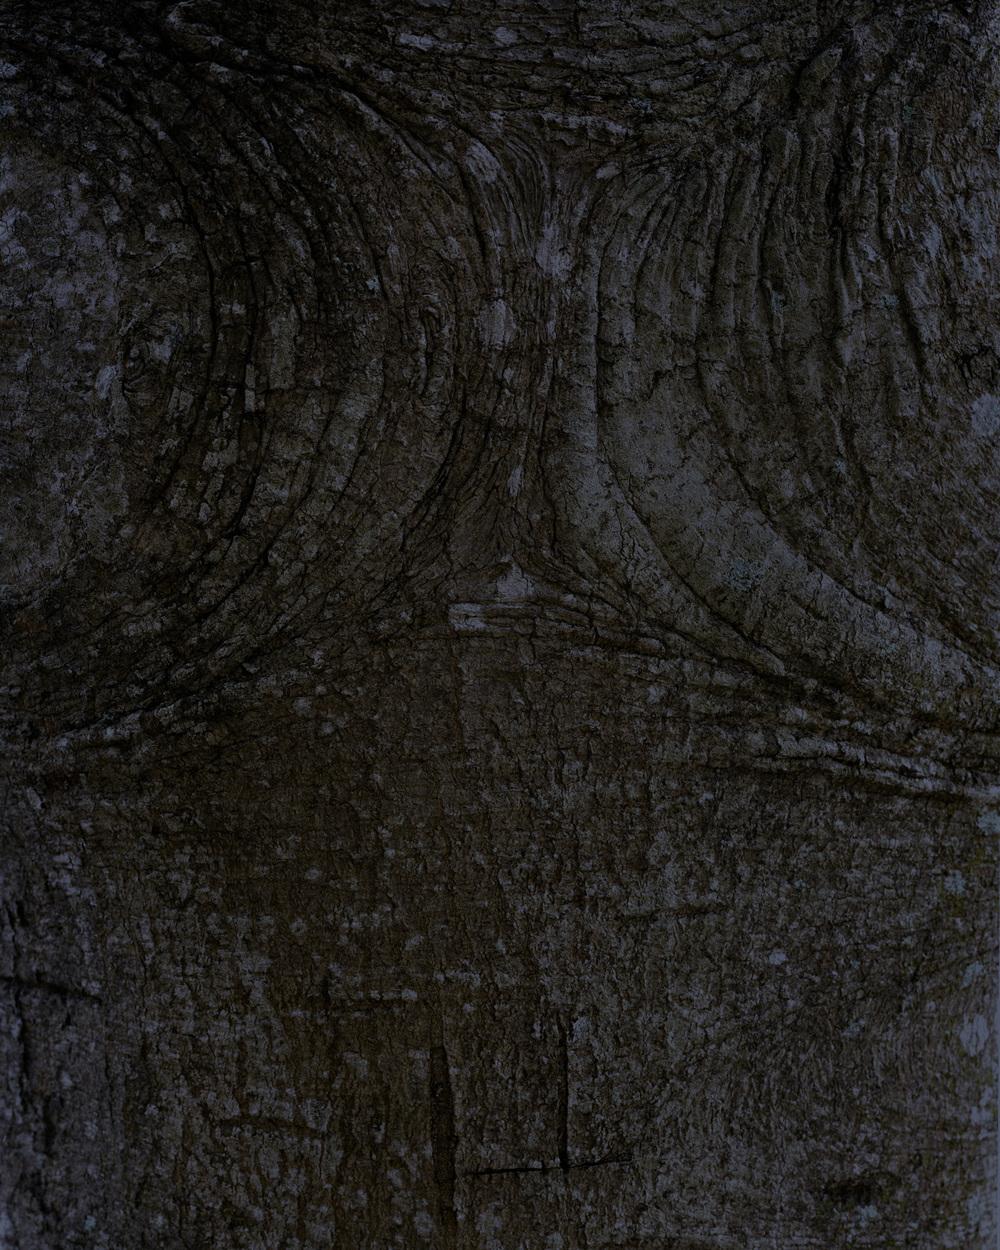 bark 10 002.jpg